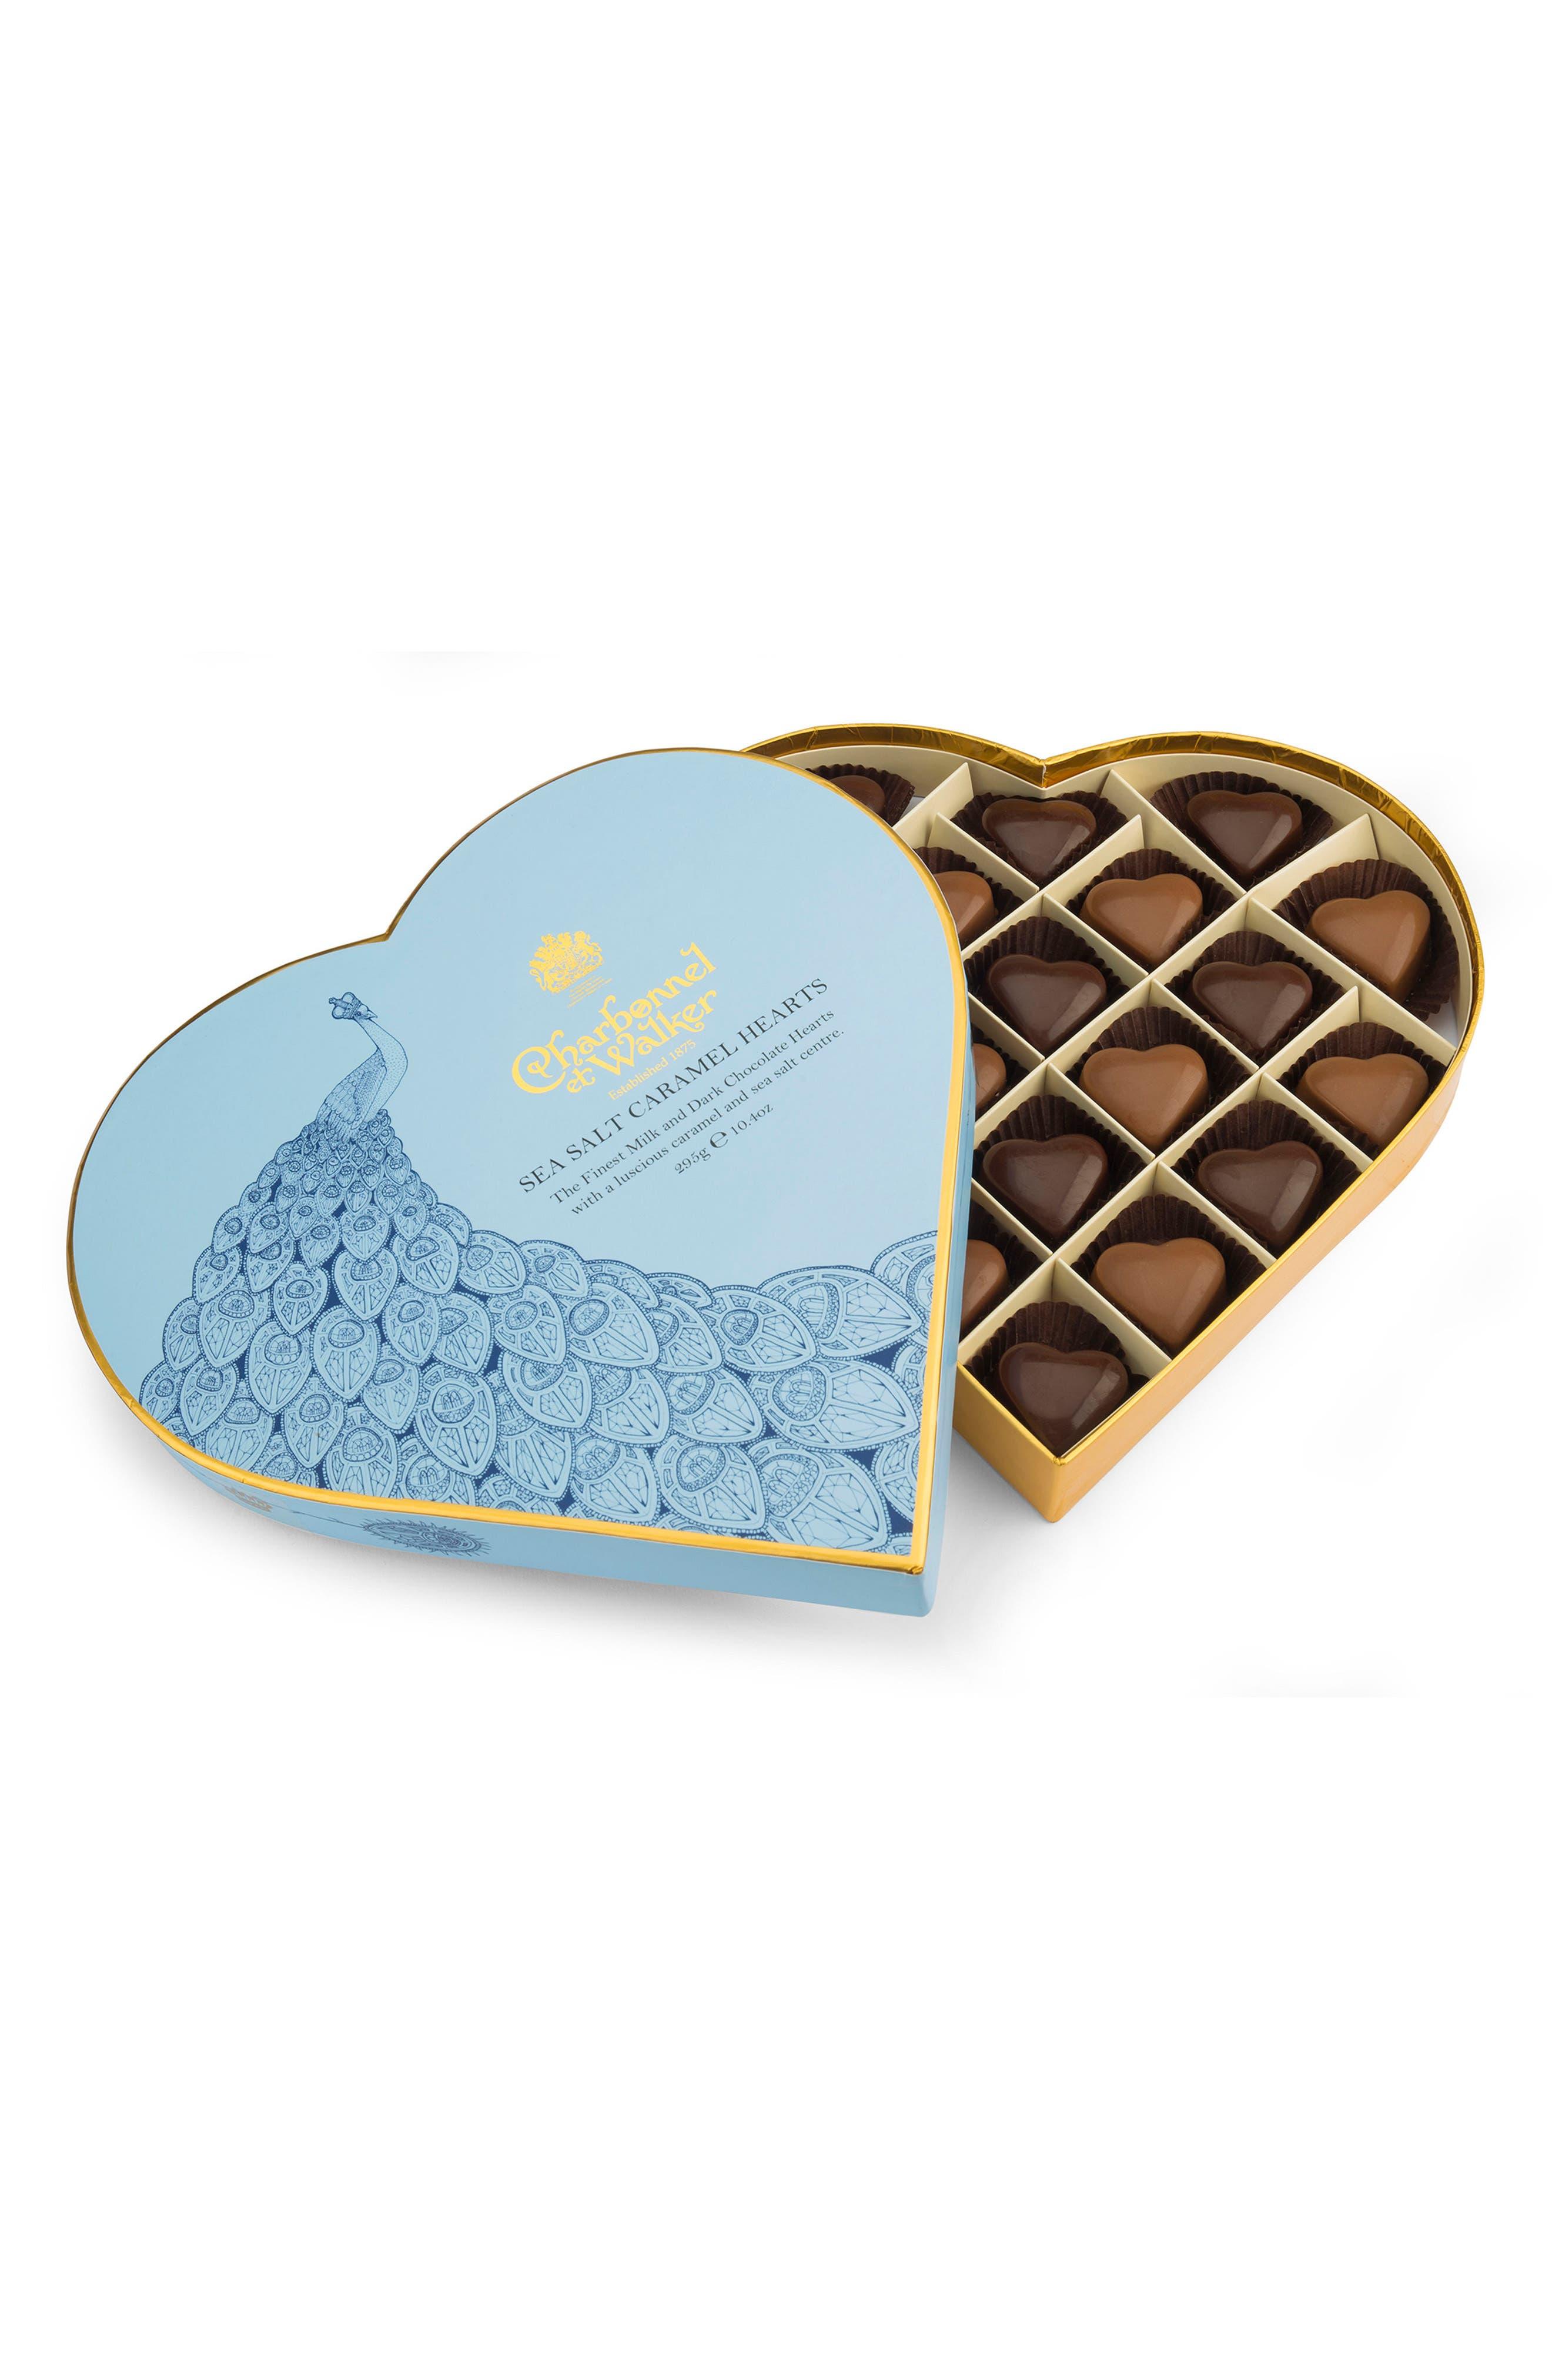 Sea Salt Caramel Chocolates in Heart Shaped Gift Box,                         Main,                         color, 400